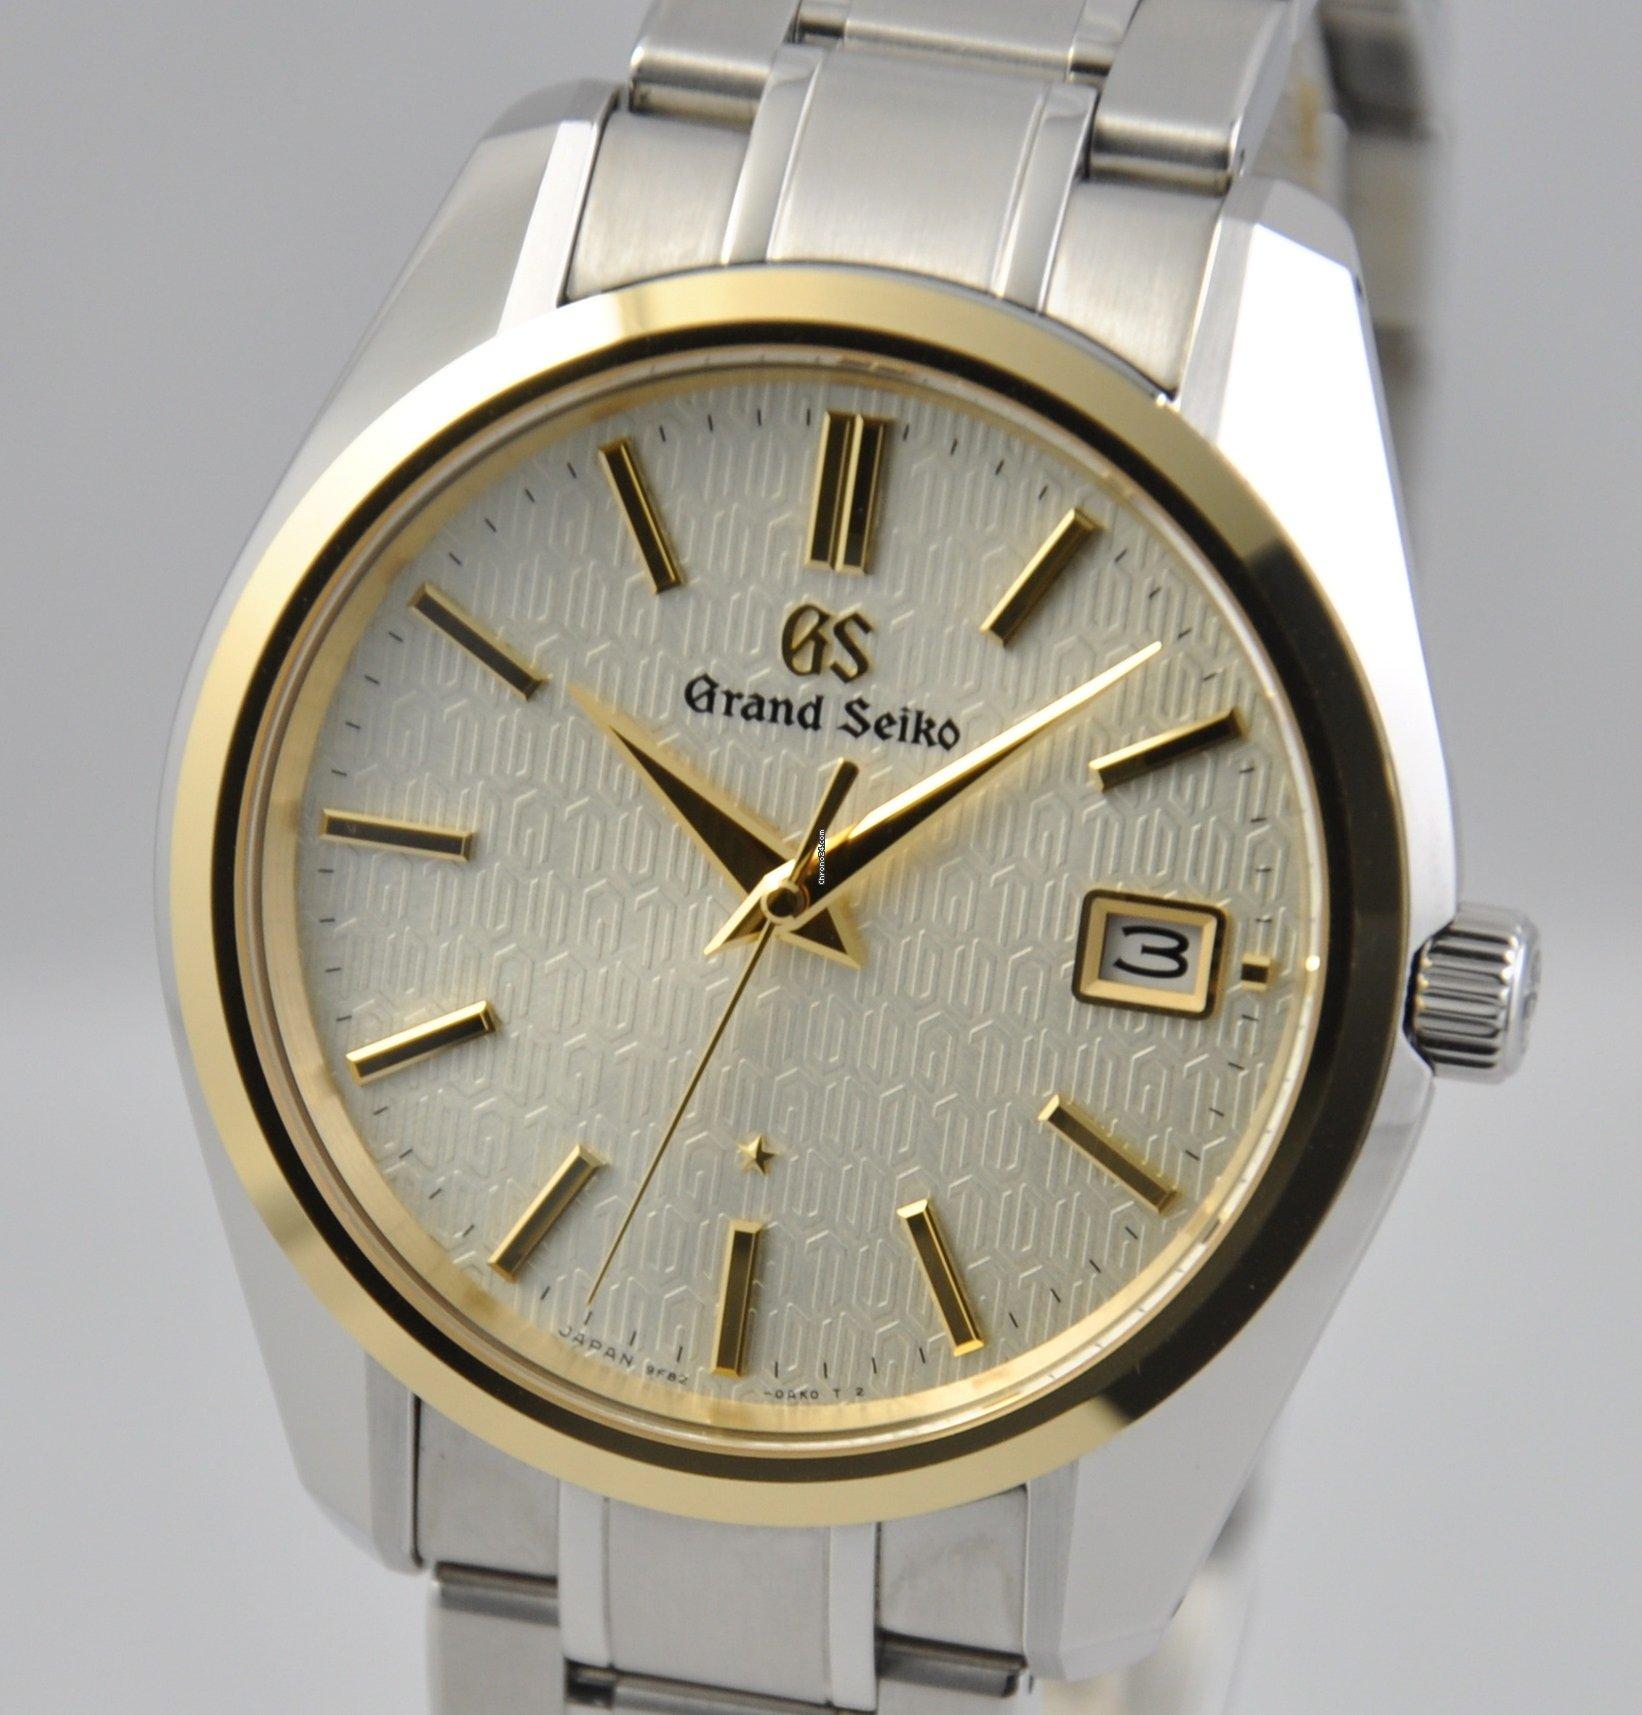 datazione vecchi orologi Seiko New York online dating gratis